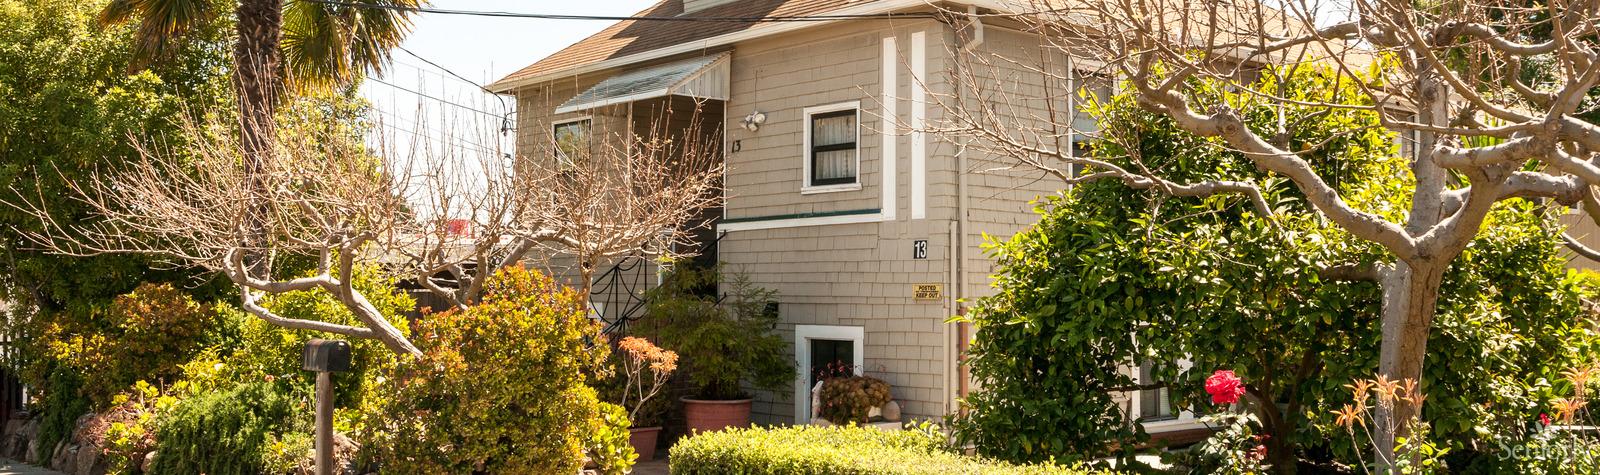 B&B Residential Facilities (13 W) San Mateo CA 3